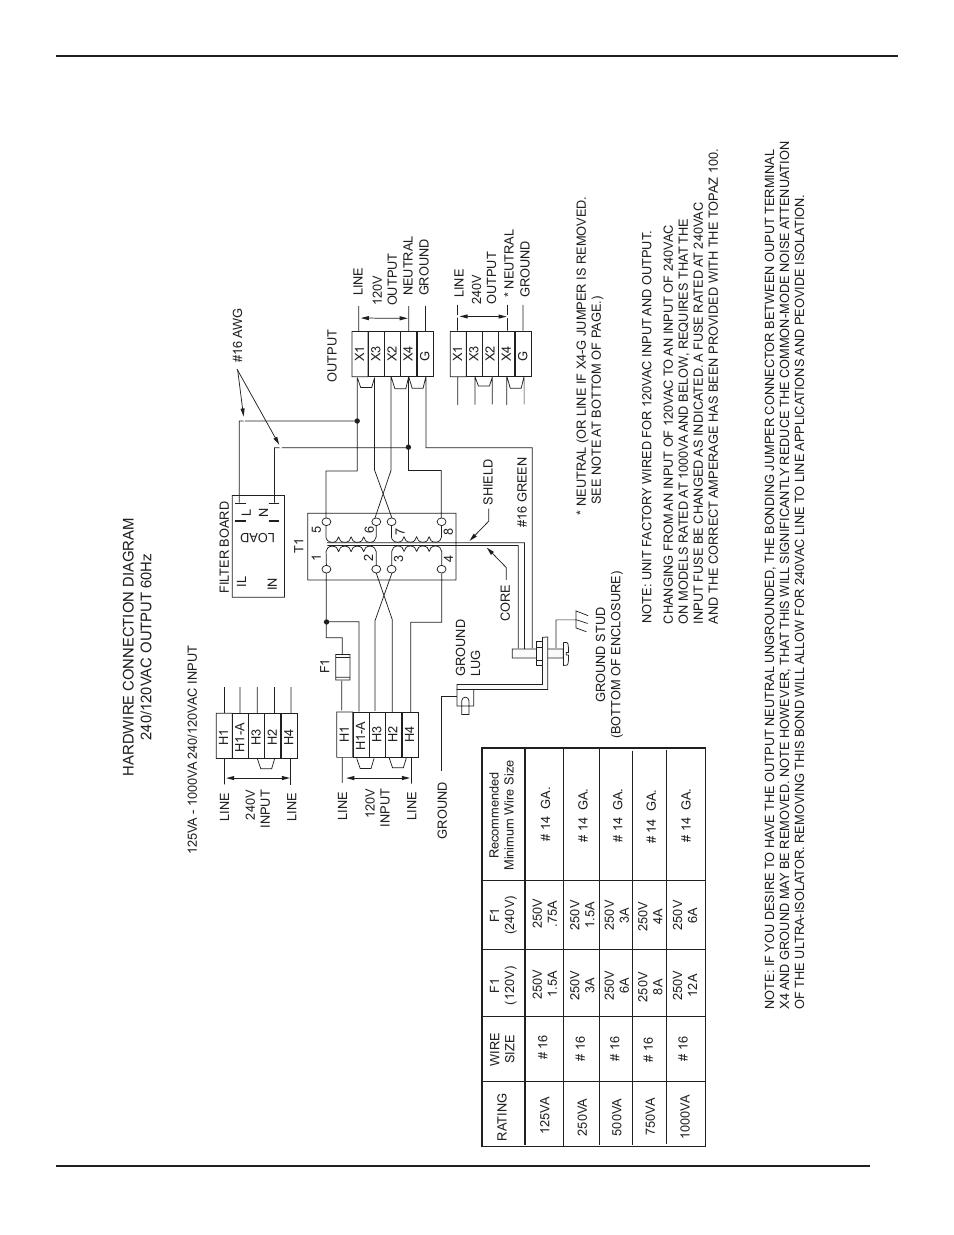 3: circuit diagram for 125va-10, Topaz 100 ultra-isolator